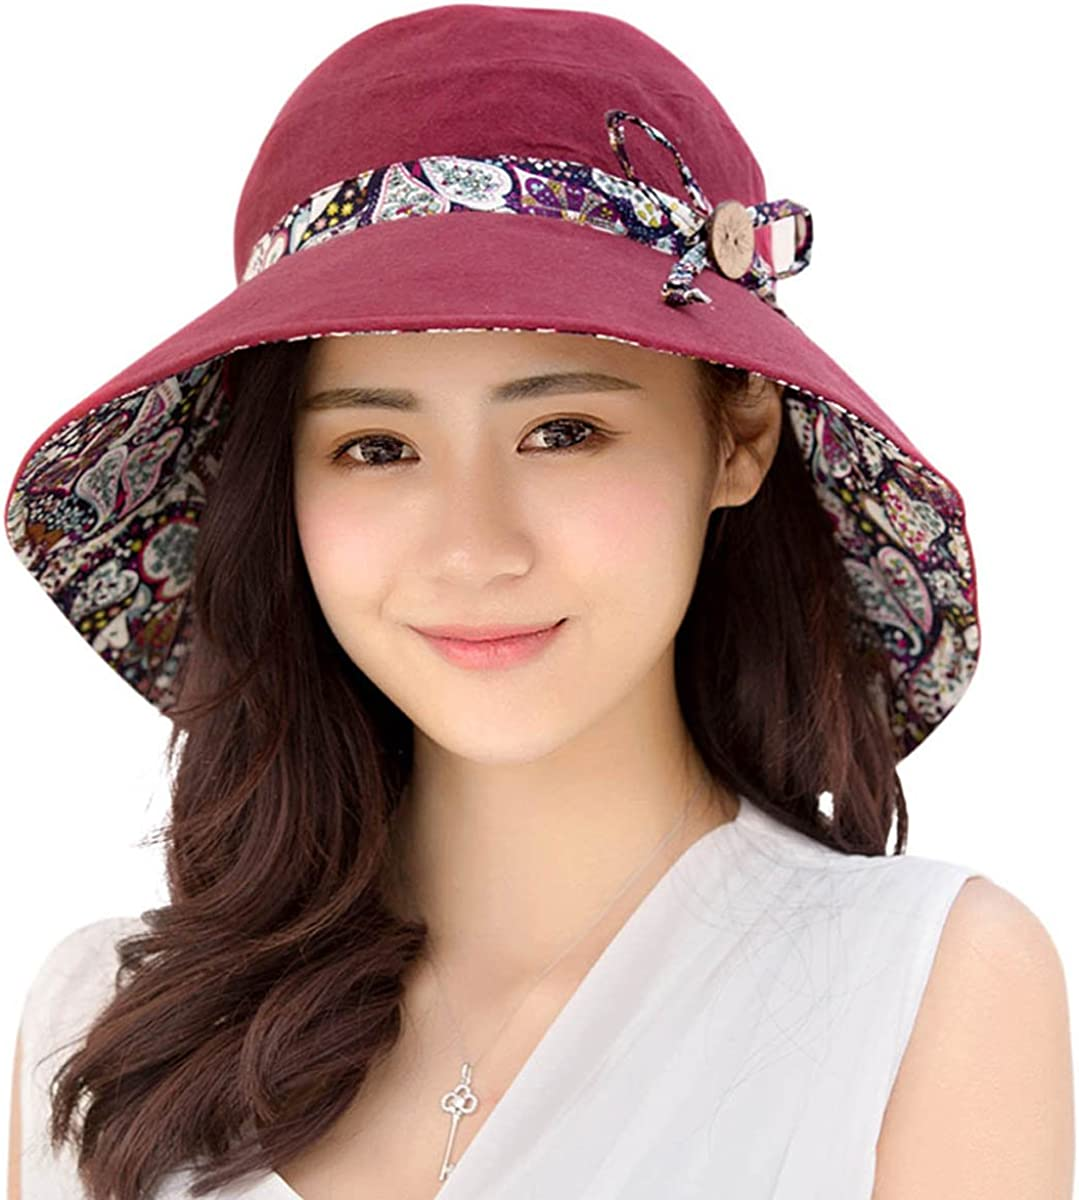 HINDAWI Womens Sun Hat Summer UPF 50+ UV Protection Beach Hat Foldable Wide Brim Cap